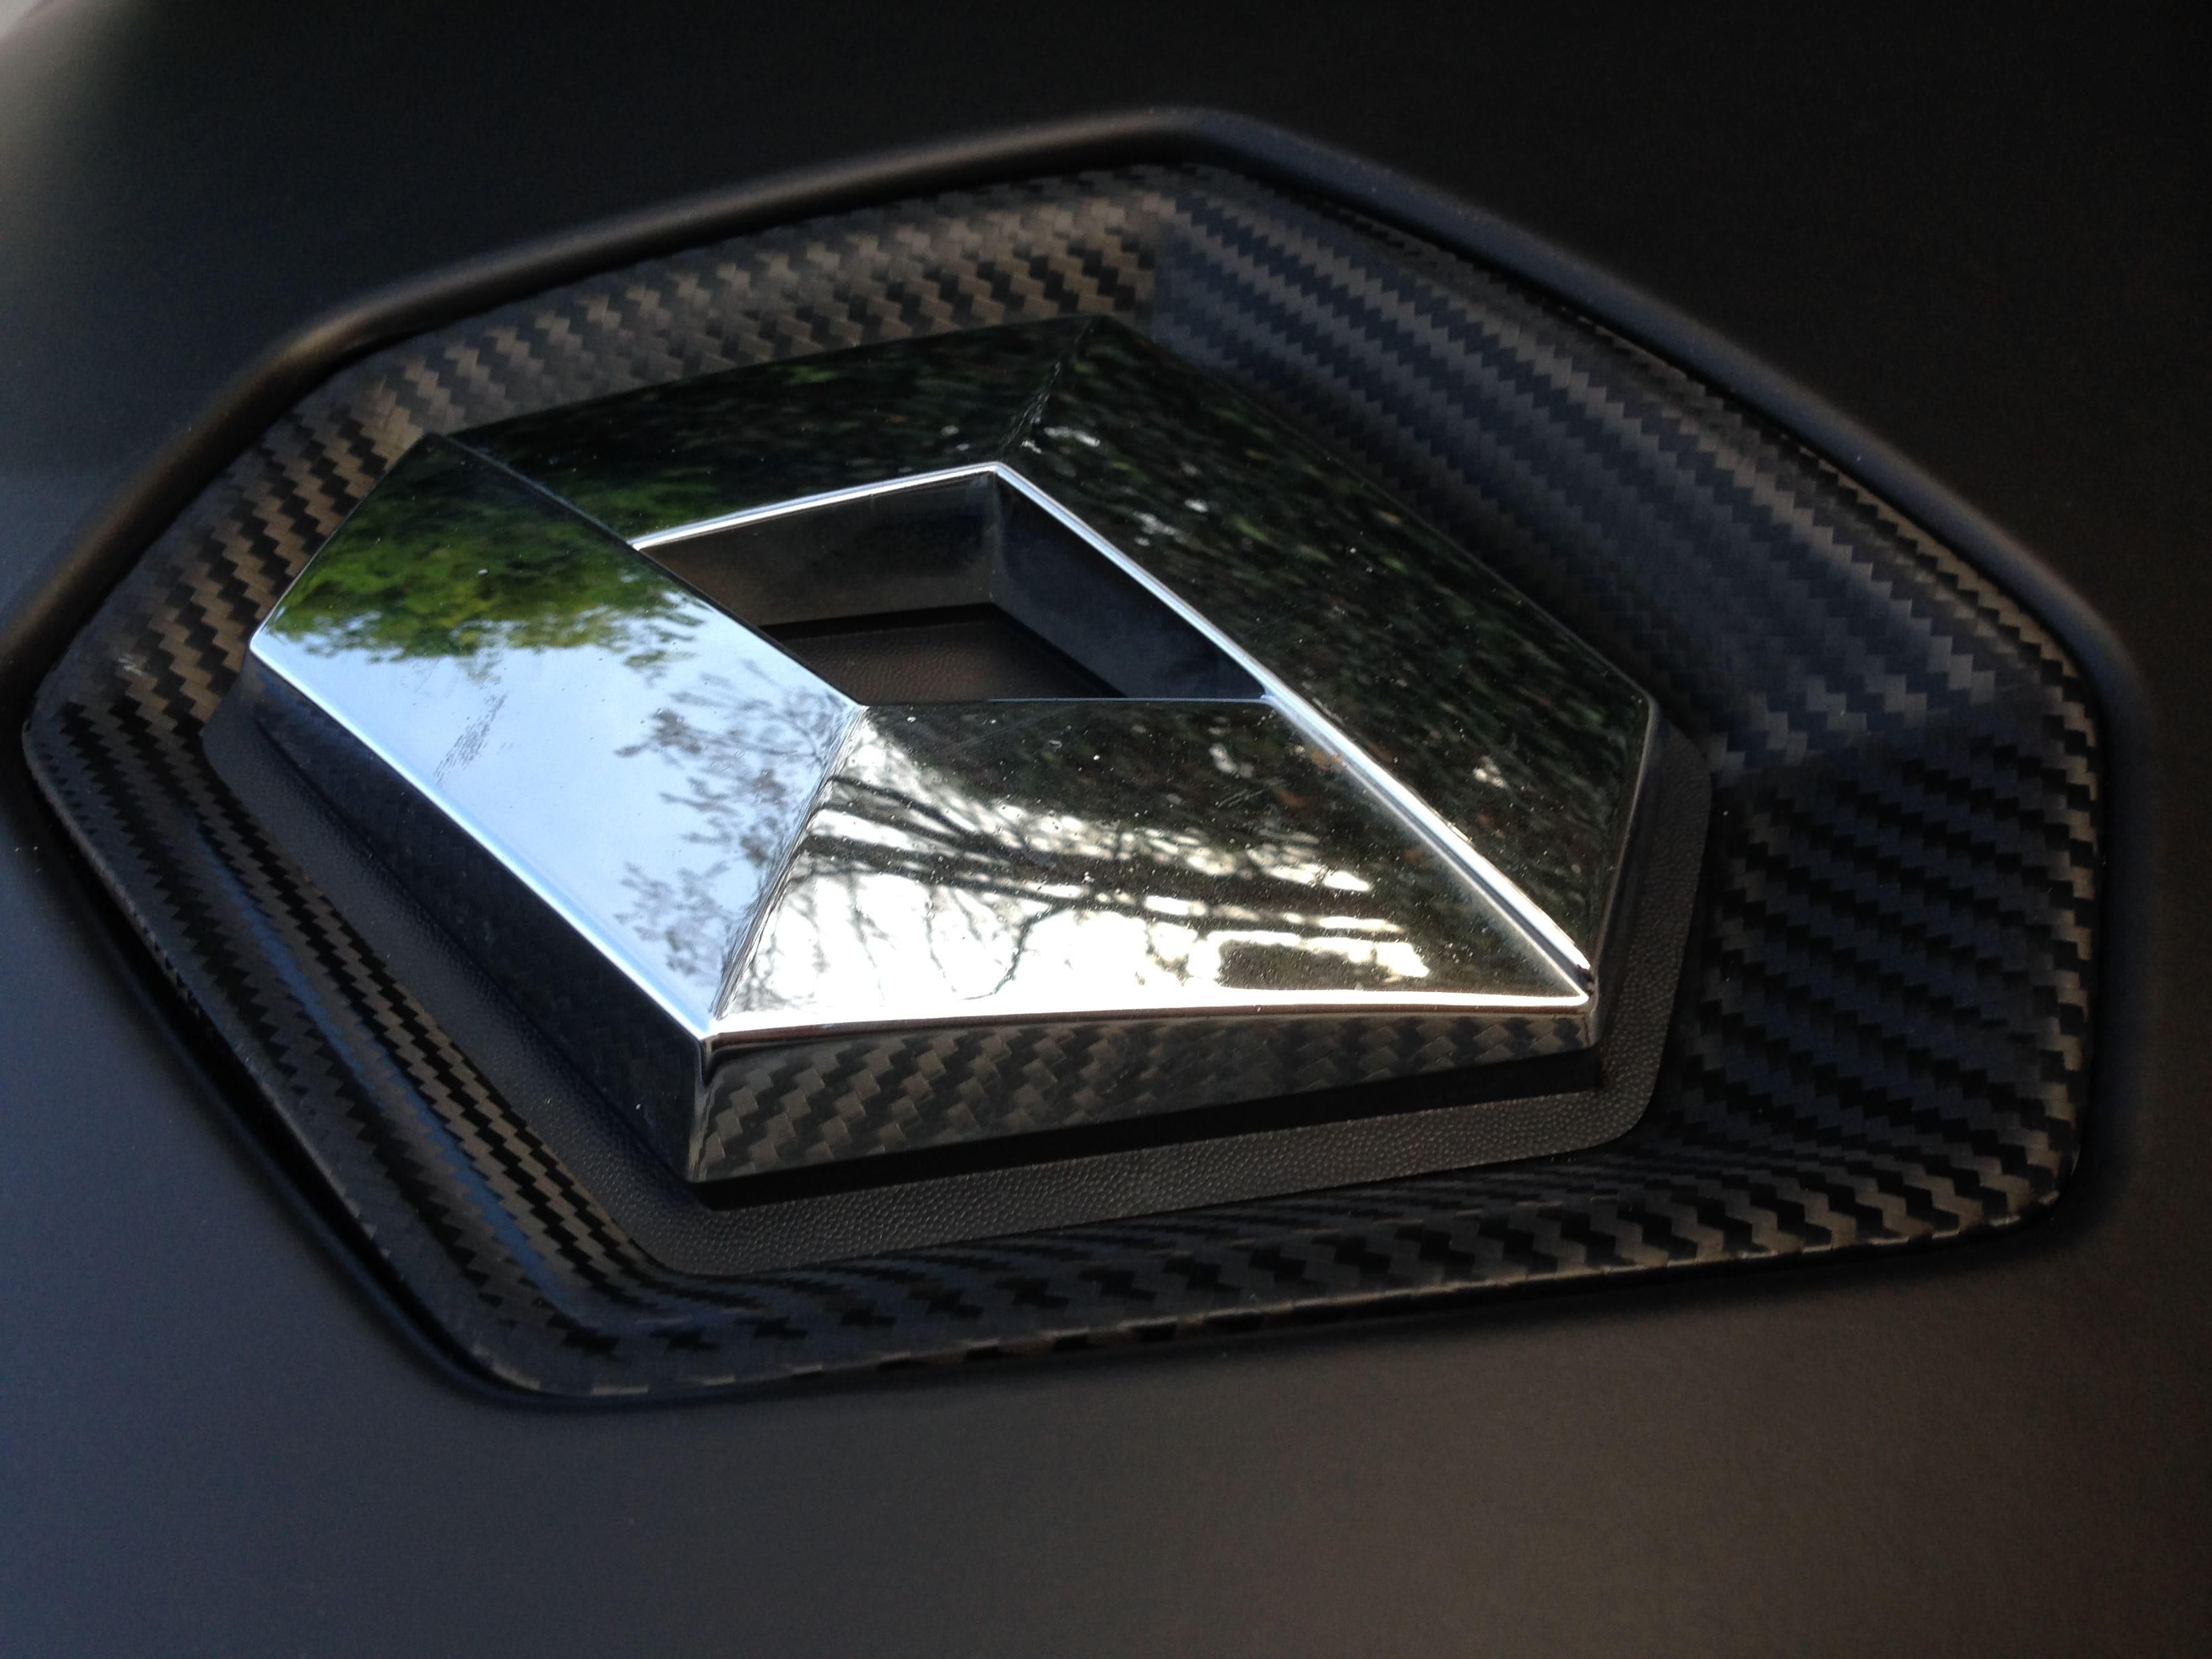 Renault Laguna Break met mat Zwarte Wrap, Carwrapping door Wrapmyride.nu Foto-nr:7179, ©2021